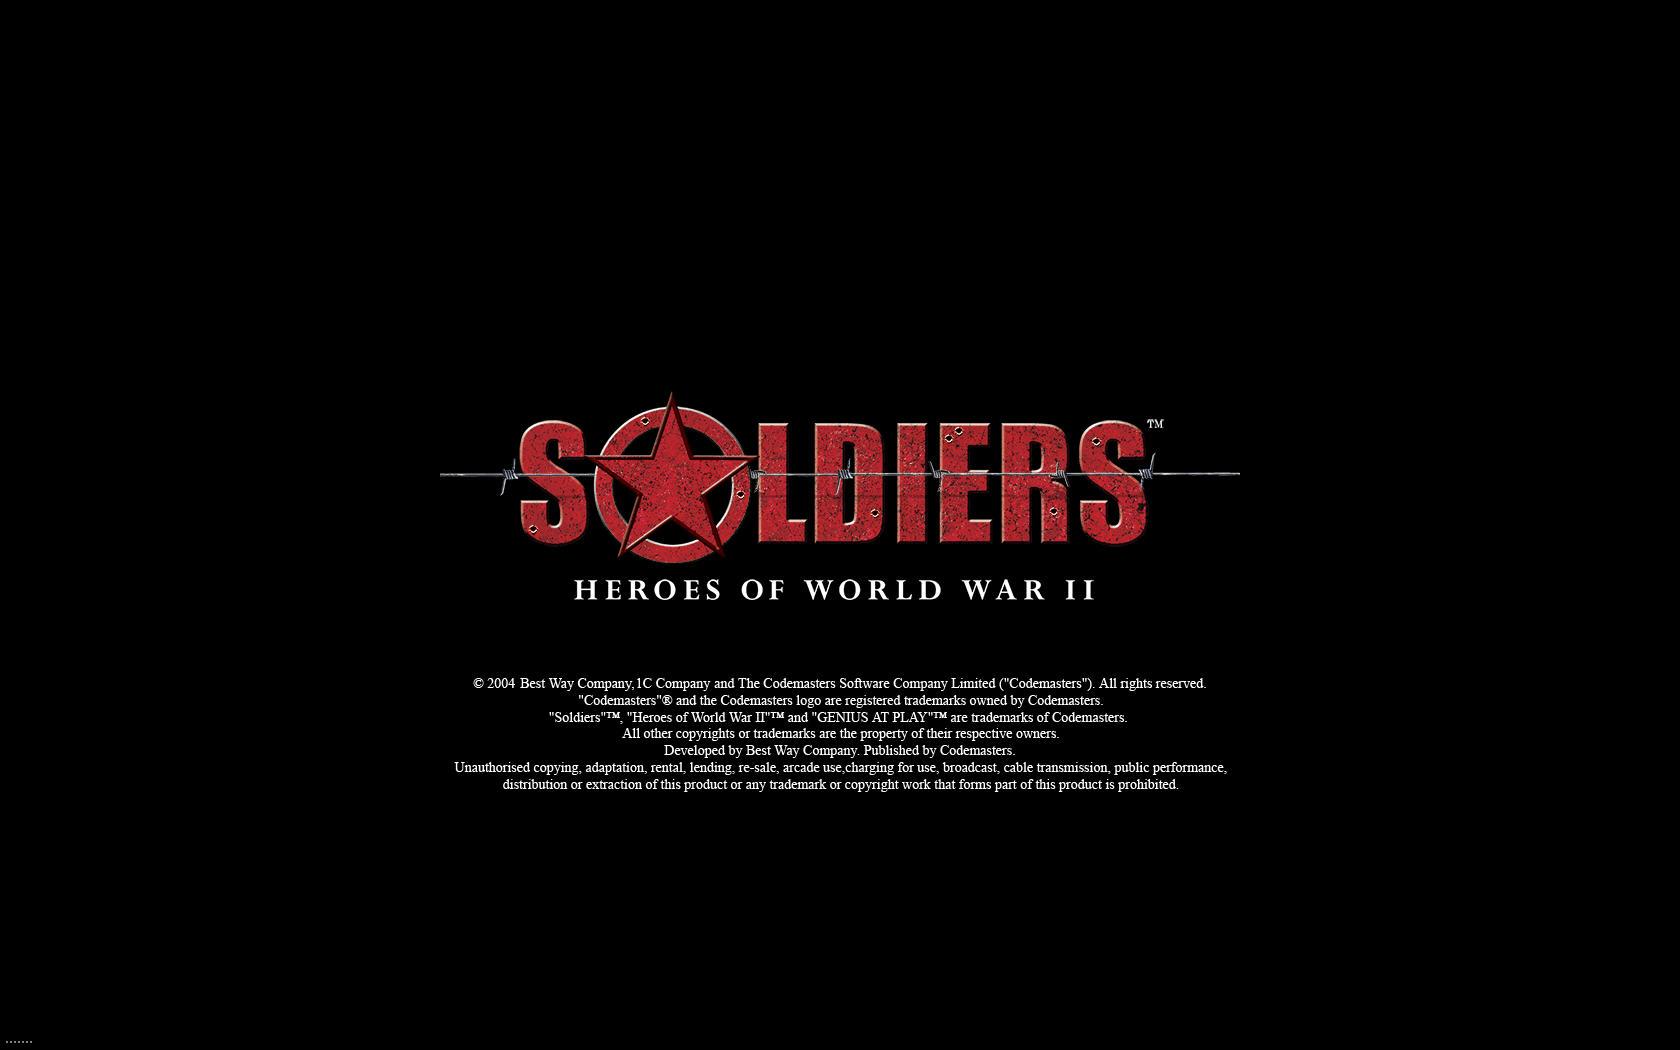 士兵:二战英雄(Soldiers:Heroes of World War 2)硬盘版截图0